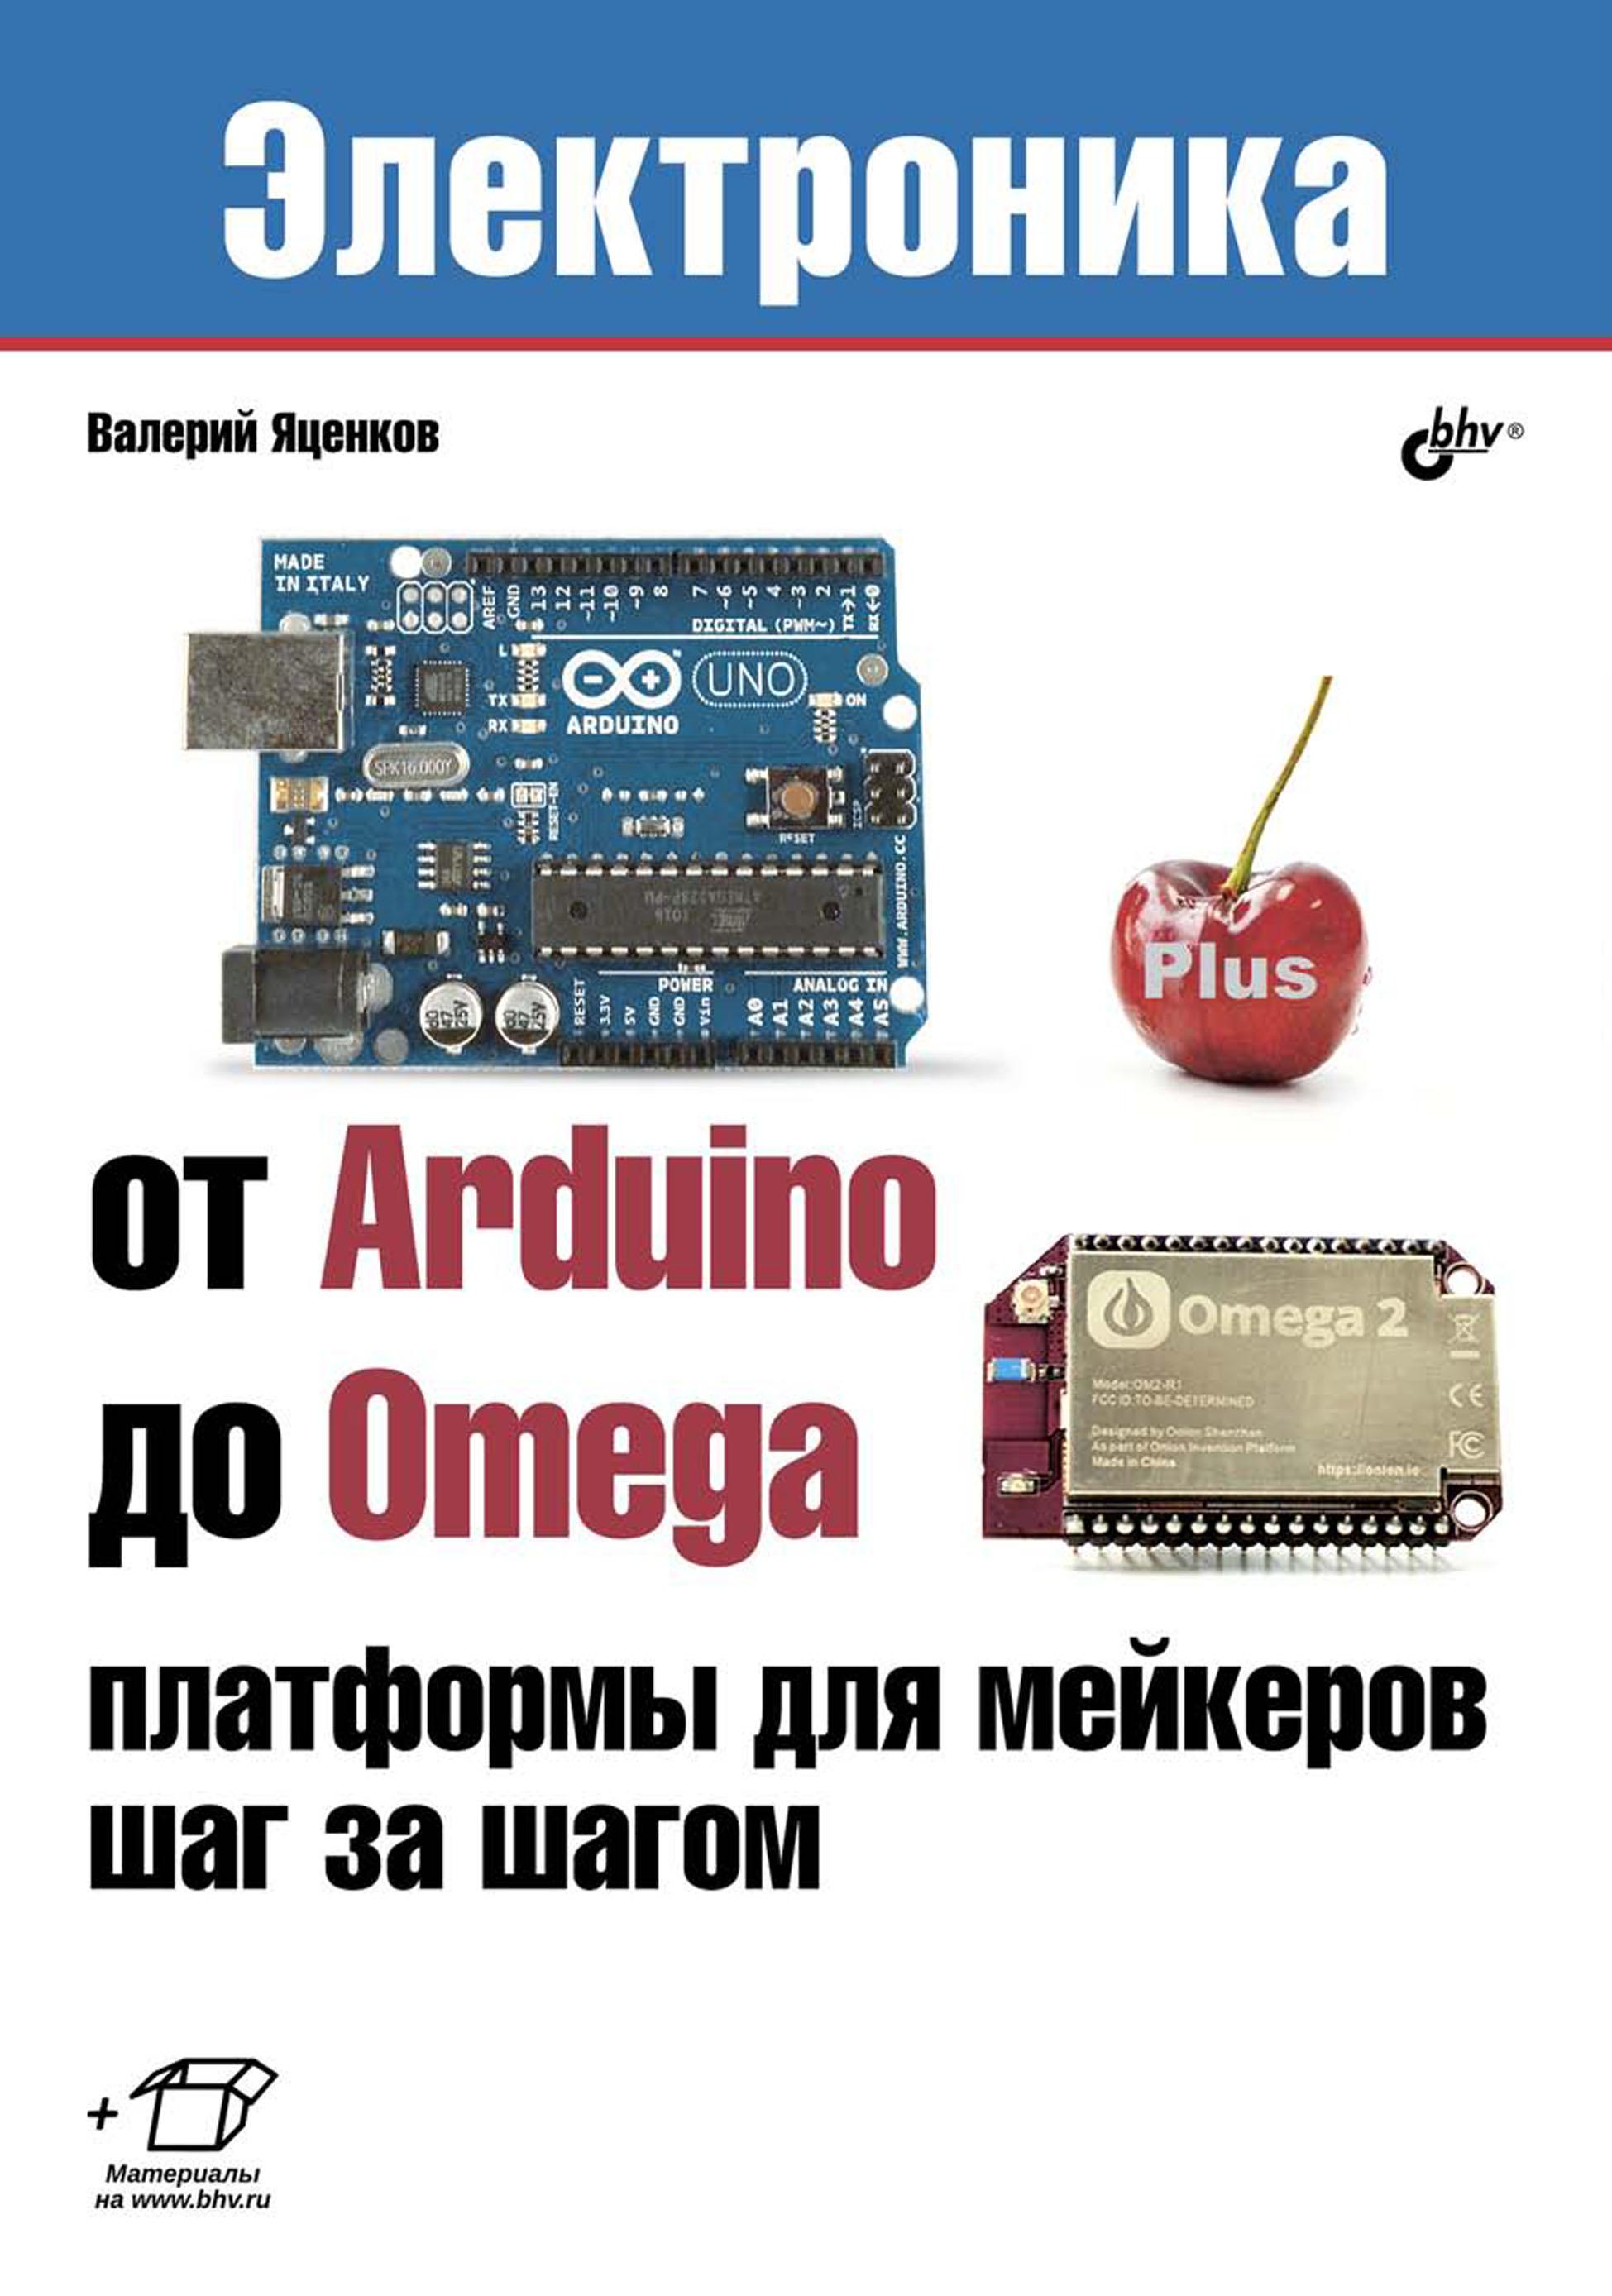 Валерий Станиславович Яценков От Arduino до Omega: платформы для мейкеров шаг за шагом tilt switch sensor module for arduino works with official arduino boards